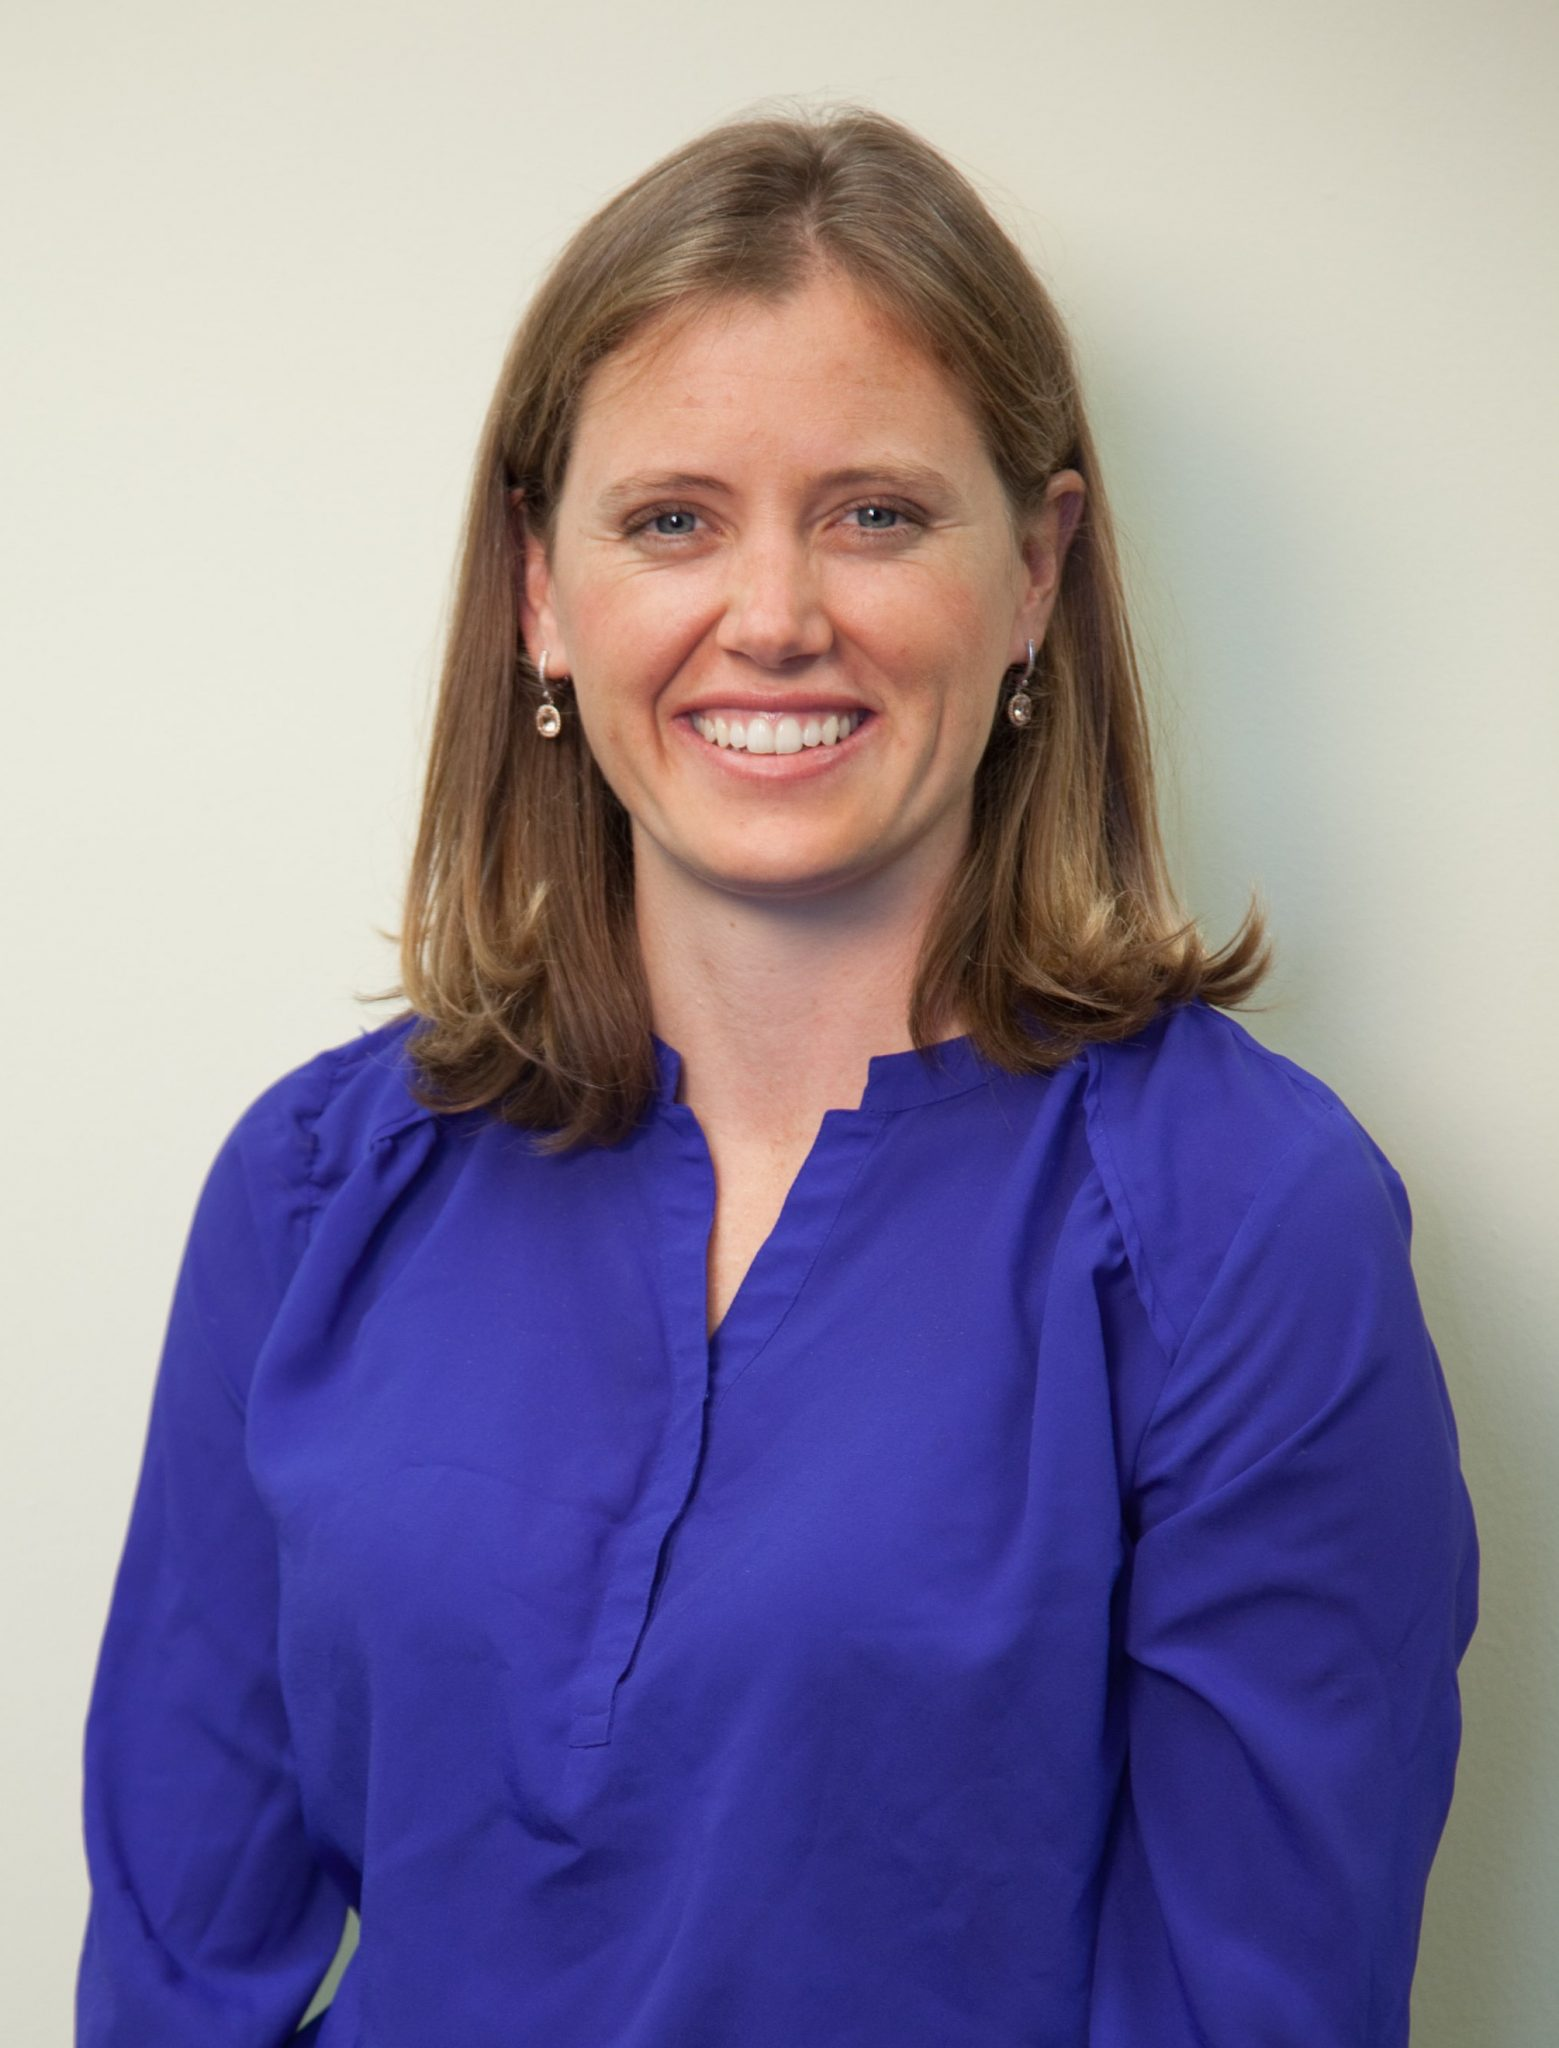 Dr Jennifer Abercrombie